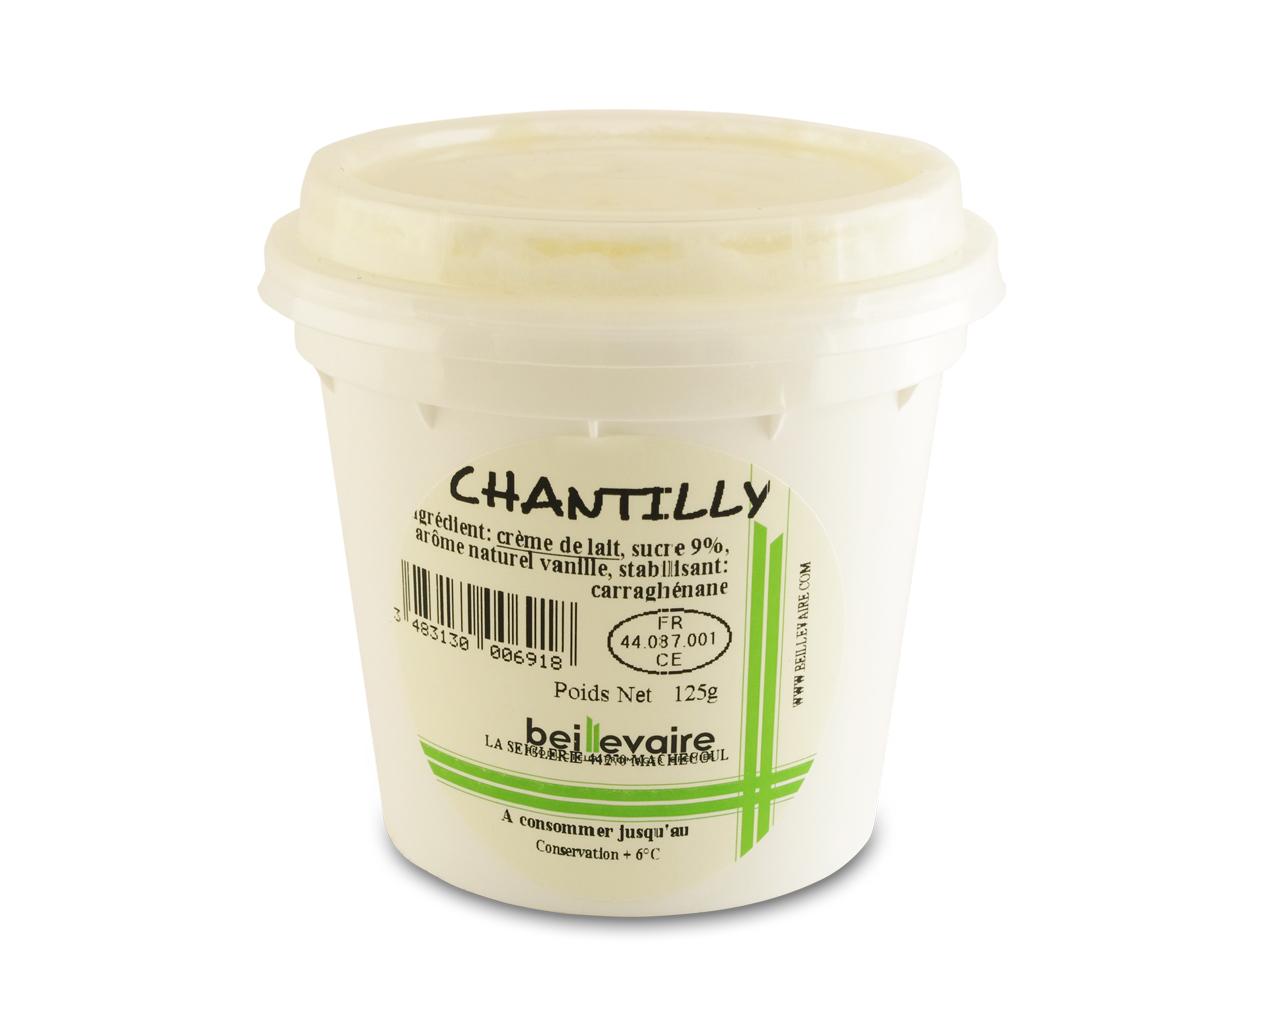 Crème chantilly, Beillevaire (110 g)